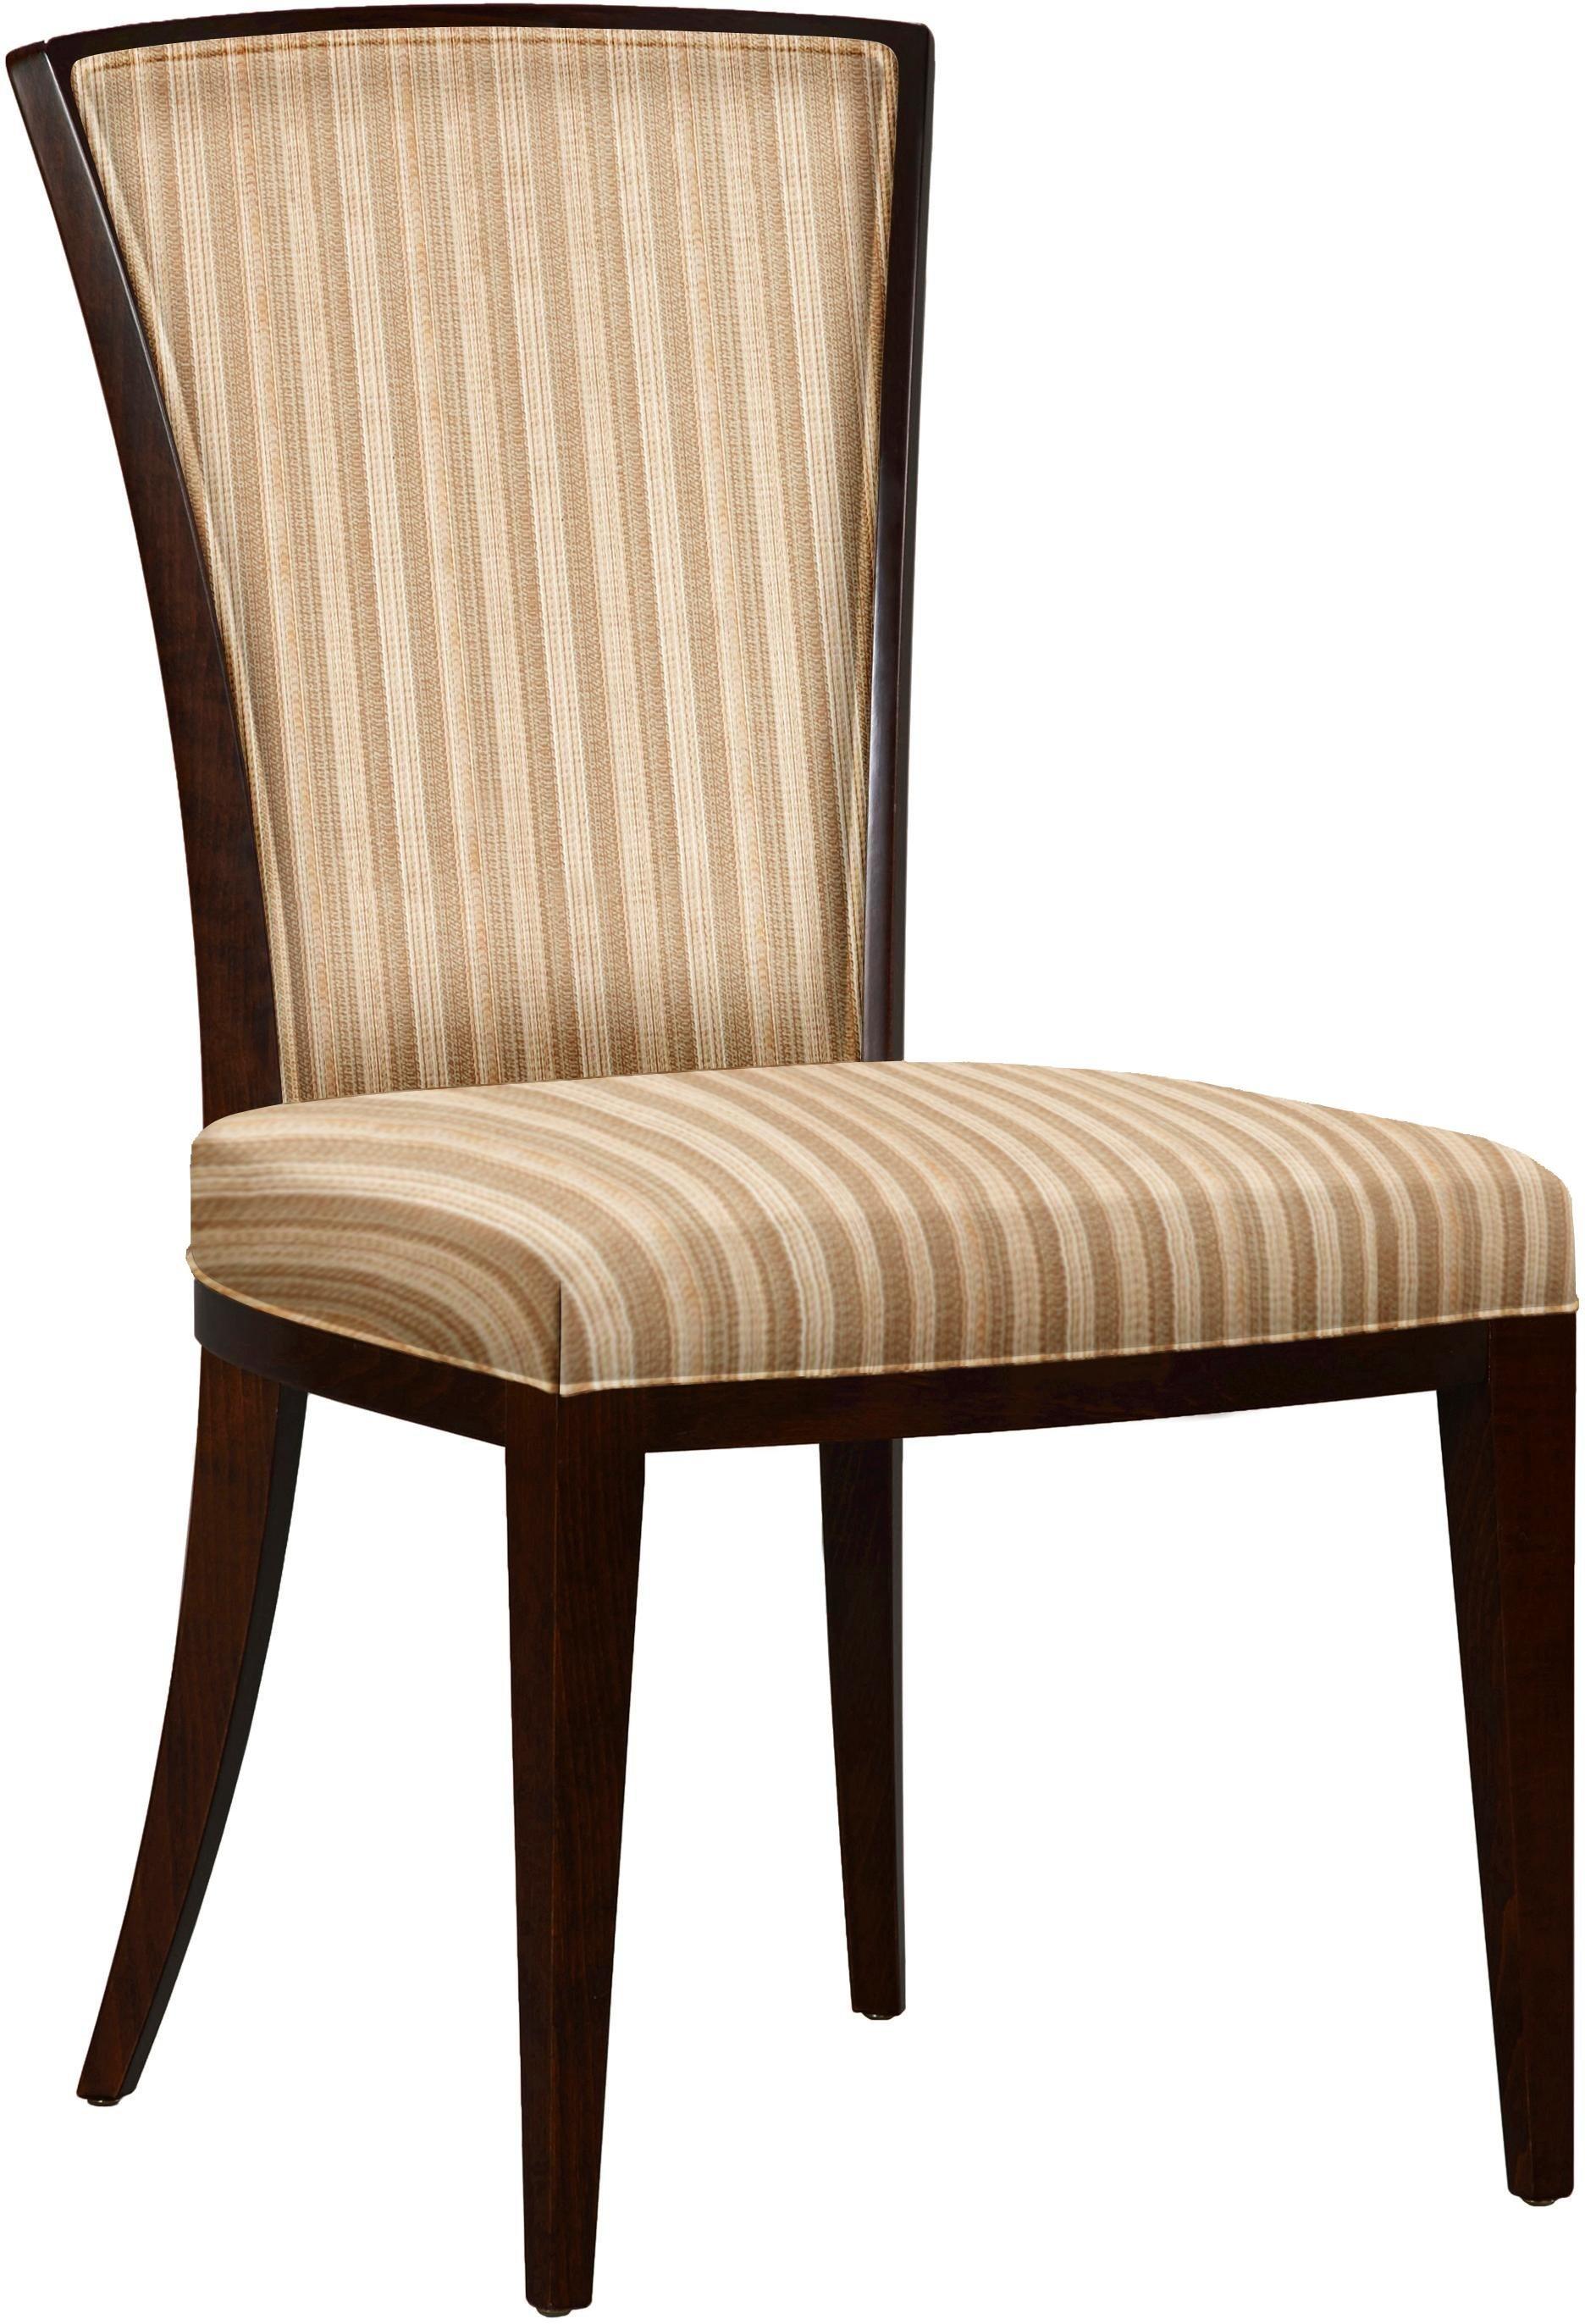 SELVA Stuhl »Luna« Modell 1231, nussbaumfarbig antik